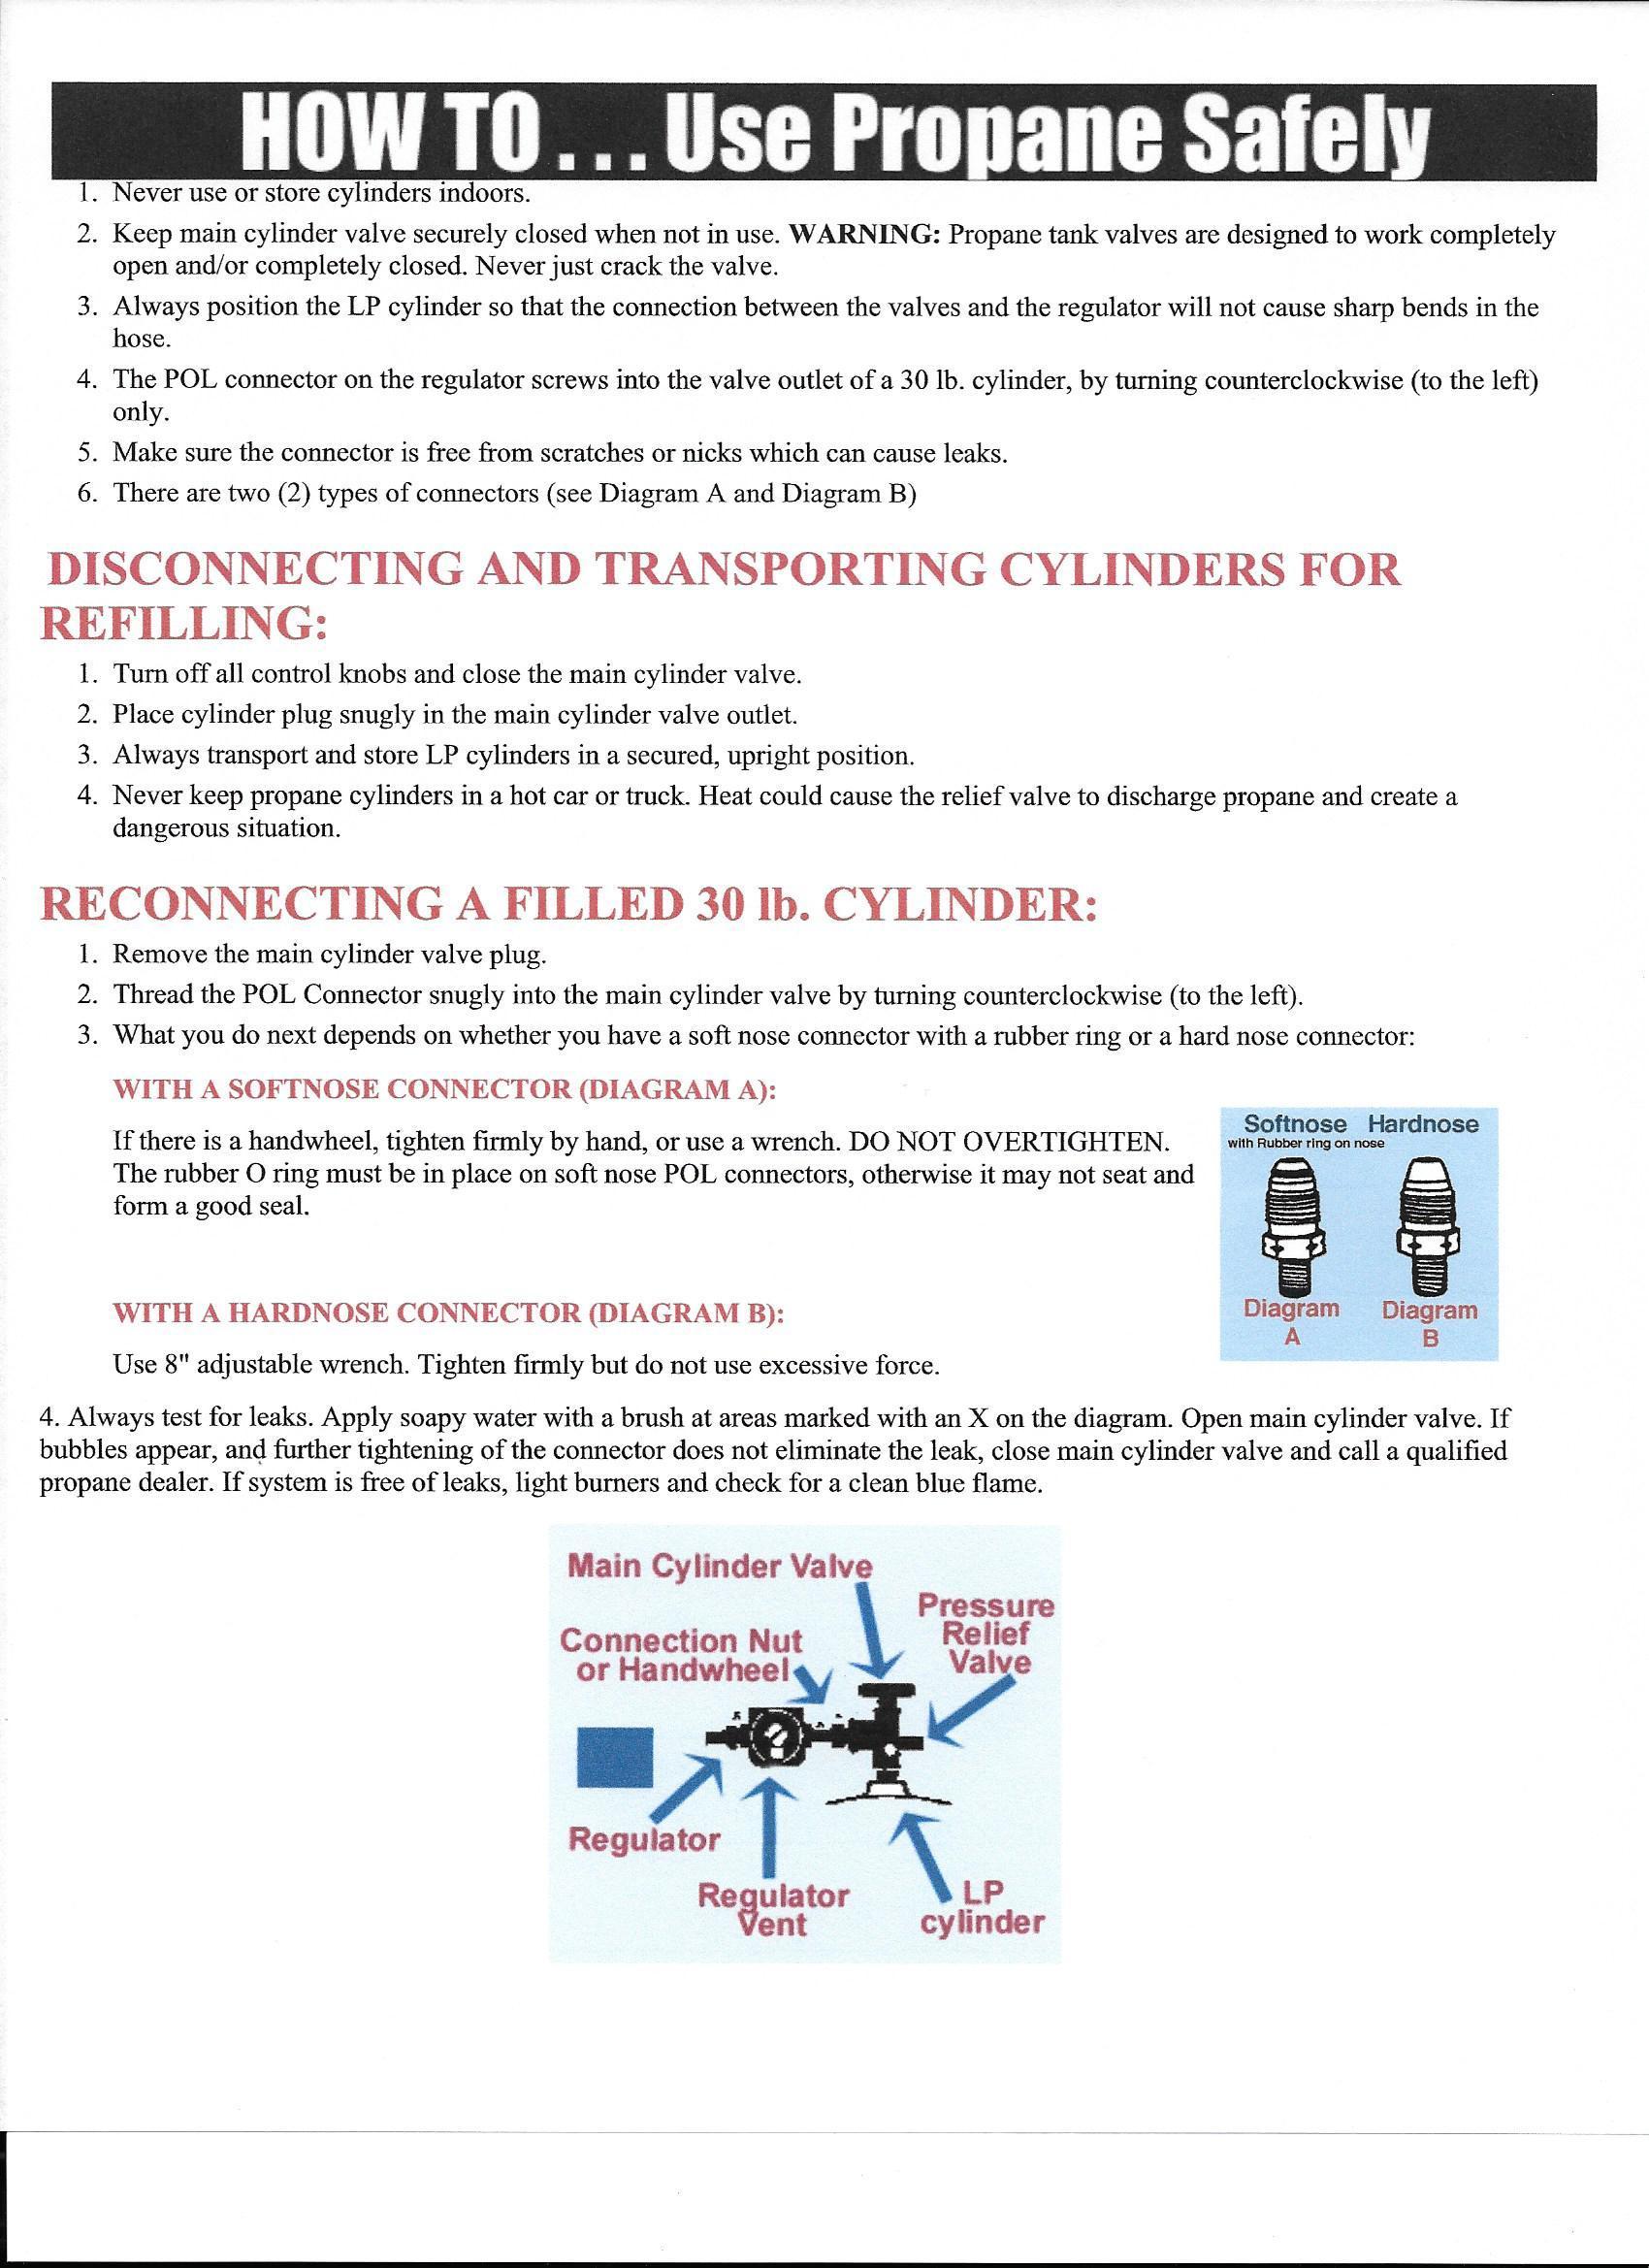 gas-grill-instructions0003.jpg